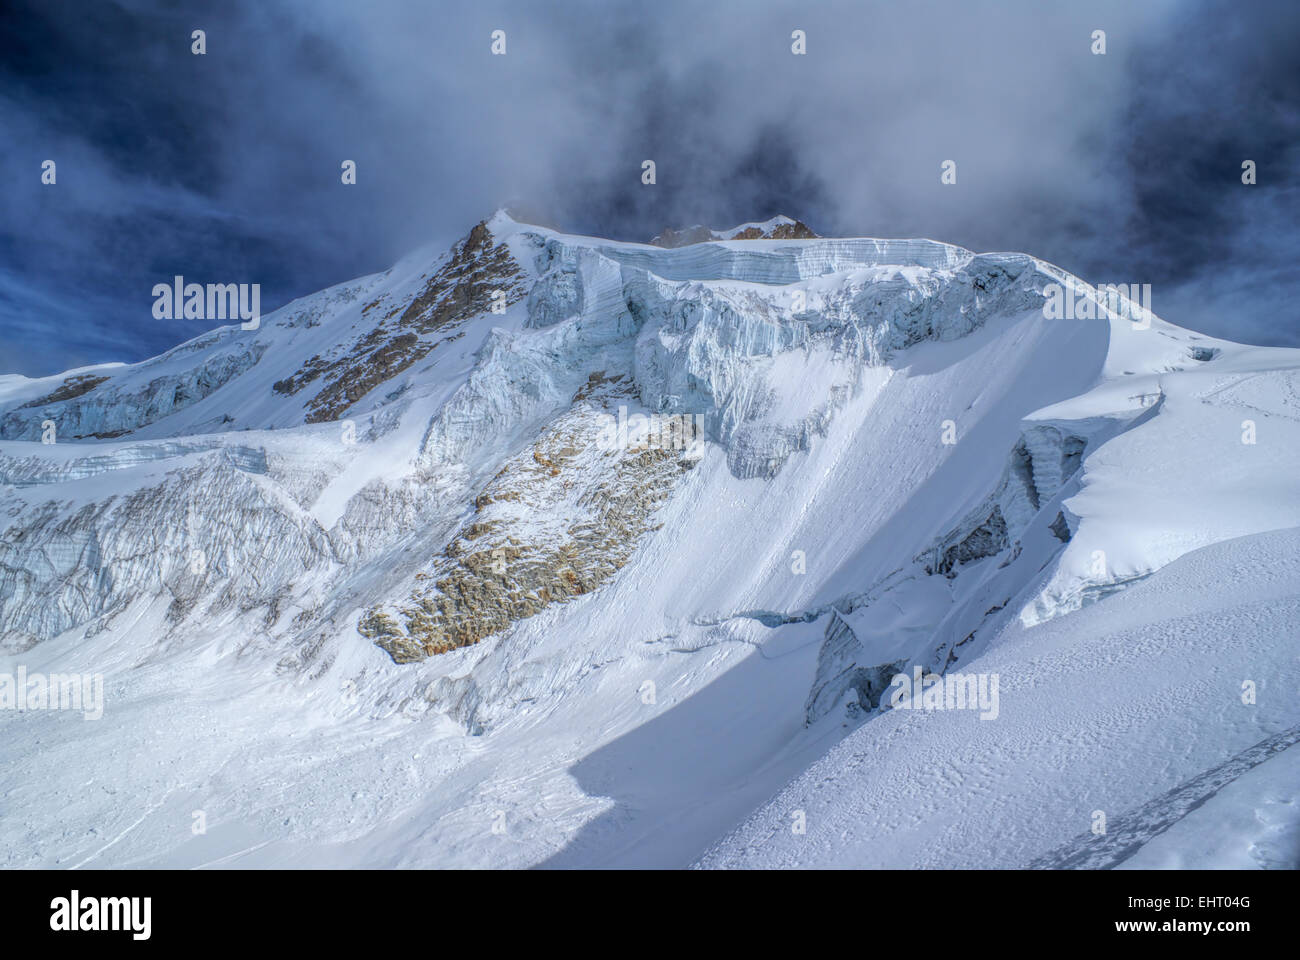 Amazing view of Huayna Potosi mountain in Bolivia - Stock Image